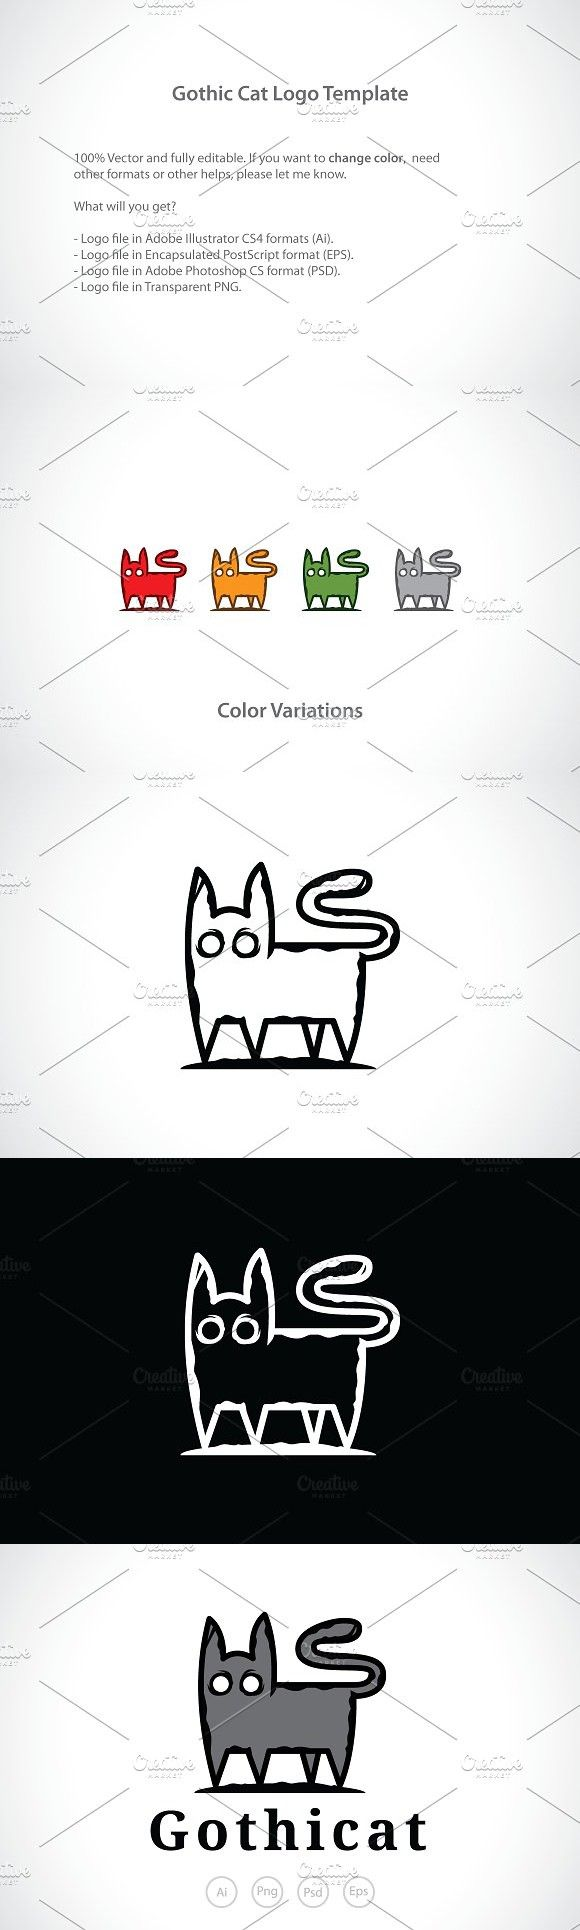 Scary Gothic Cat Logo Template Logo Templates Cat Logo Templates